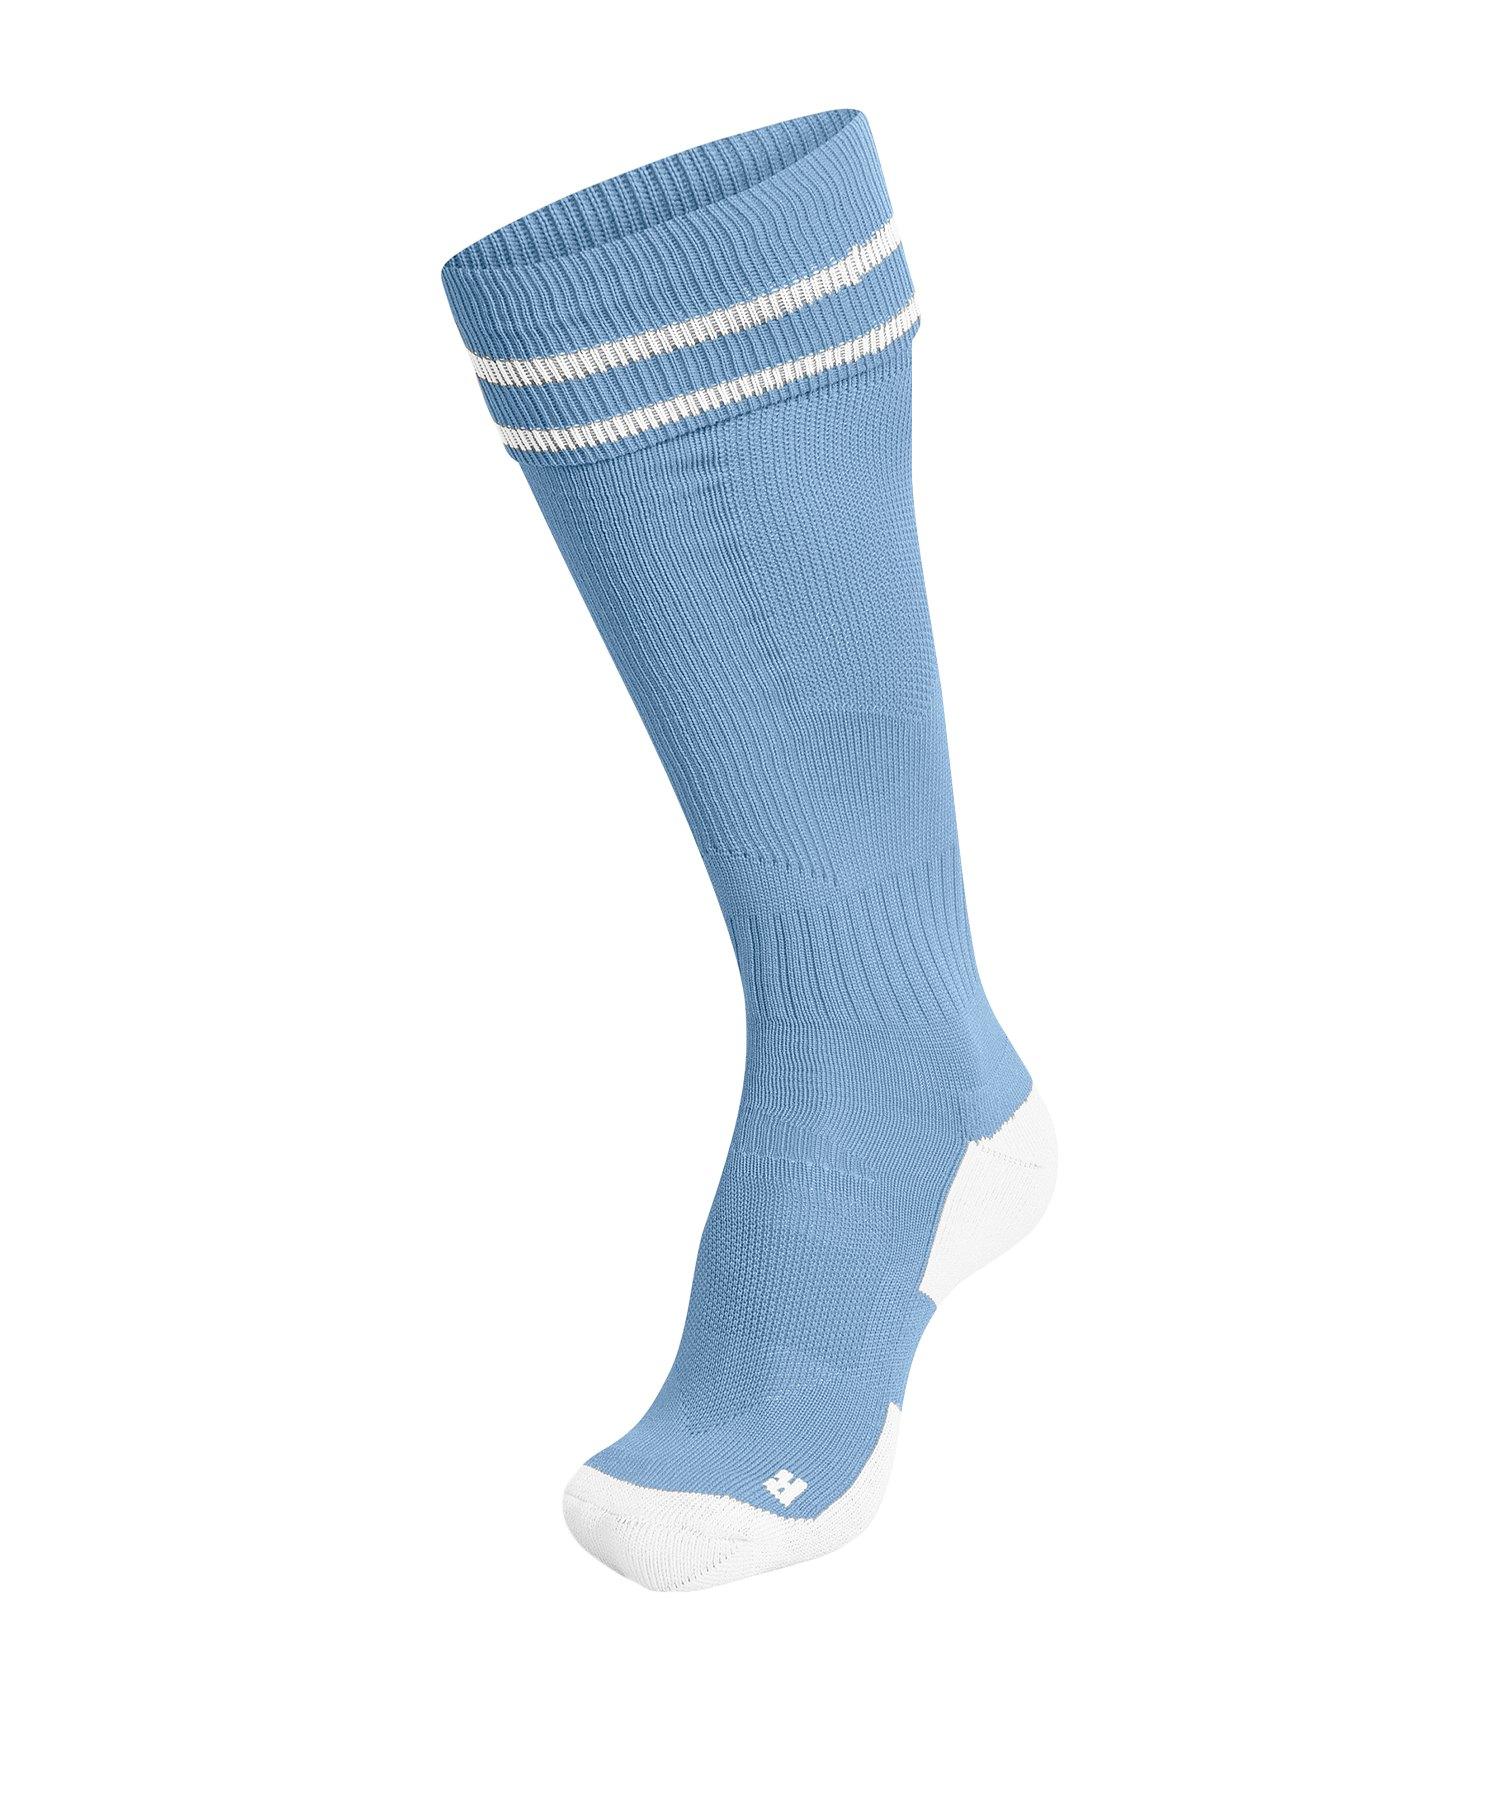 Hummel Football Sock Socken Blau F7473 - Blau